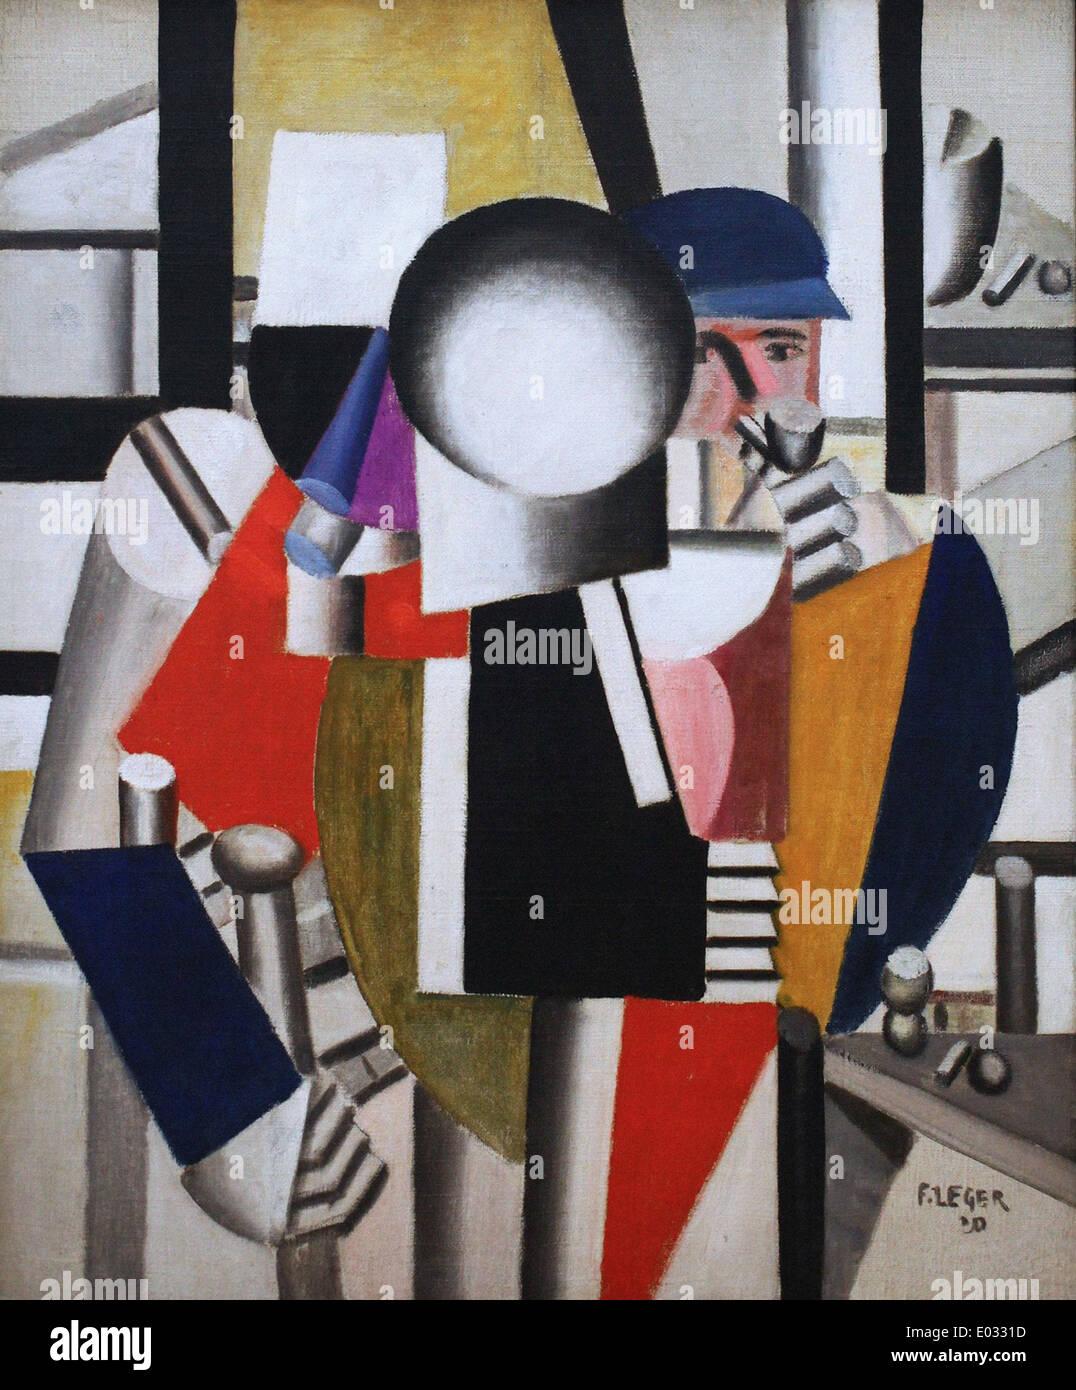 Fernand Léger Les trois camarades Photo Stock